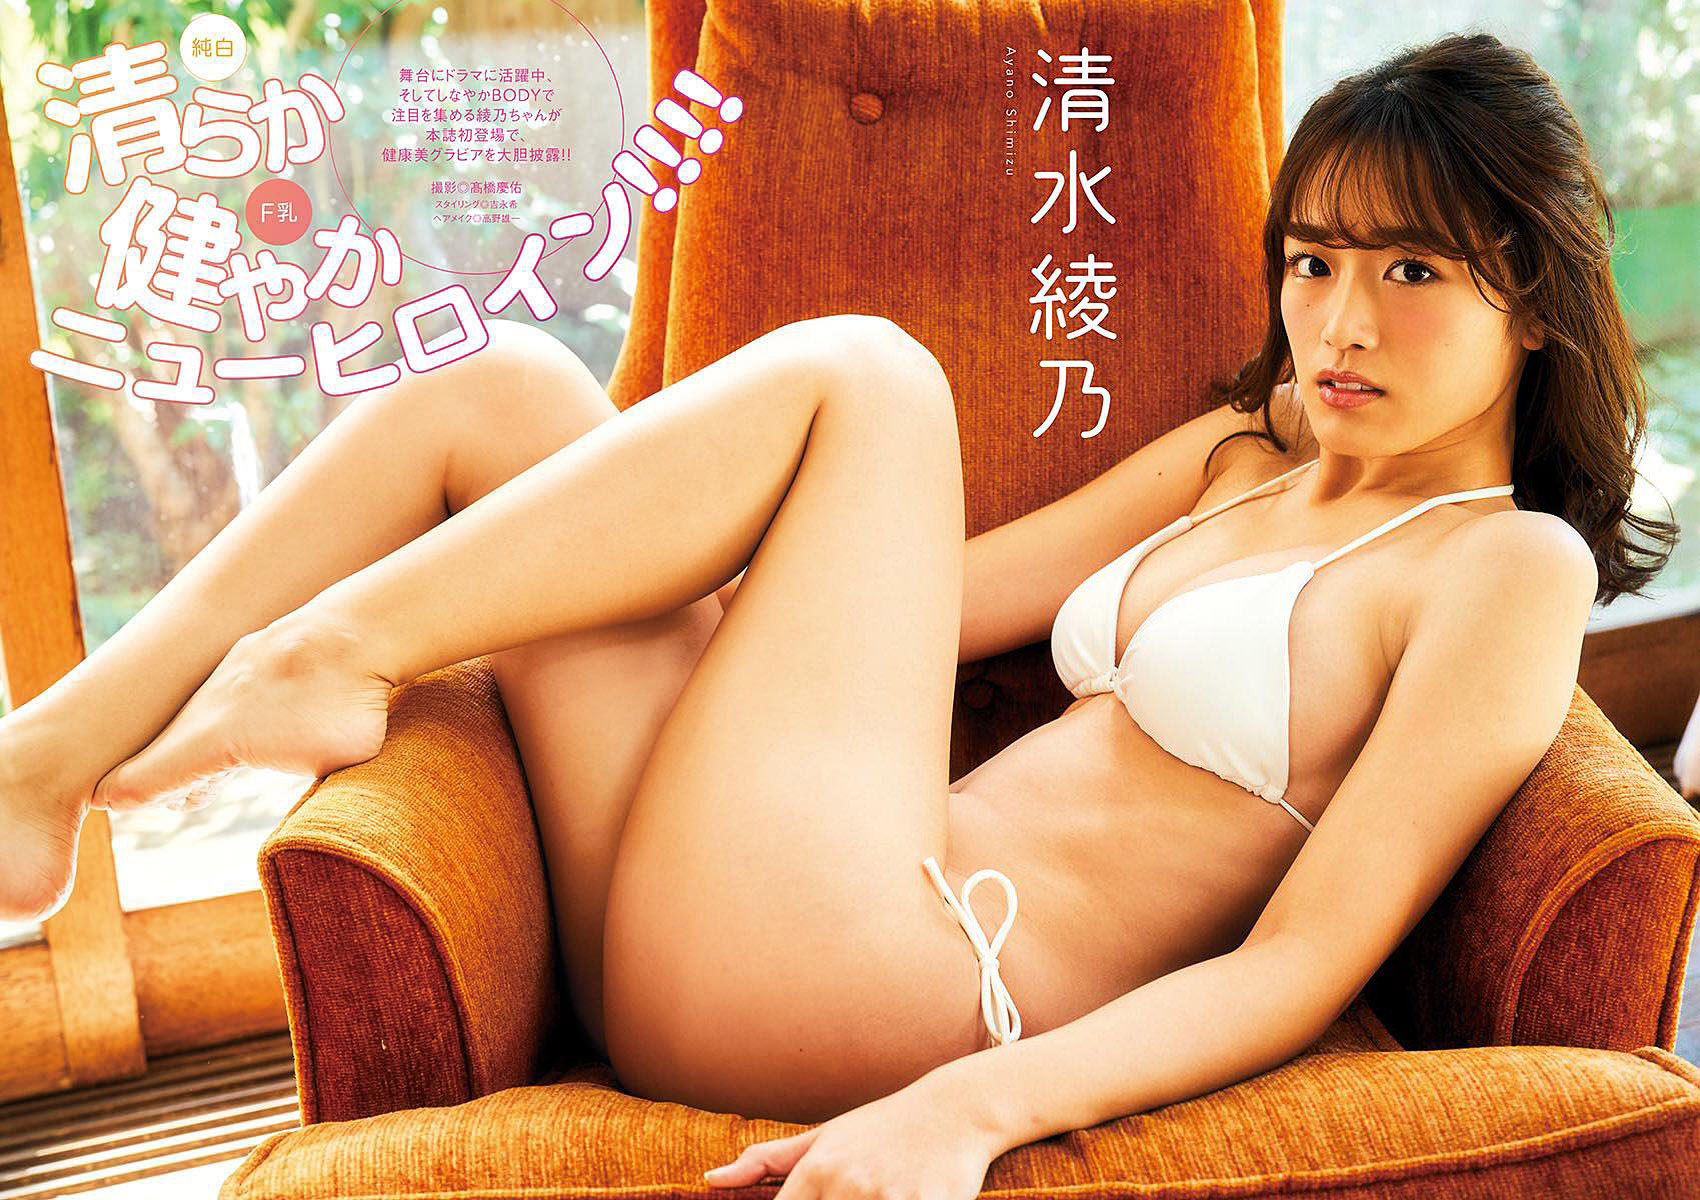 Ayano Shimizu Manga Action 191217 03.jpg